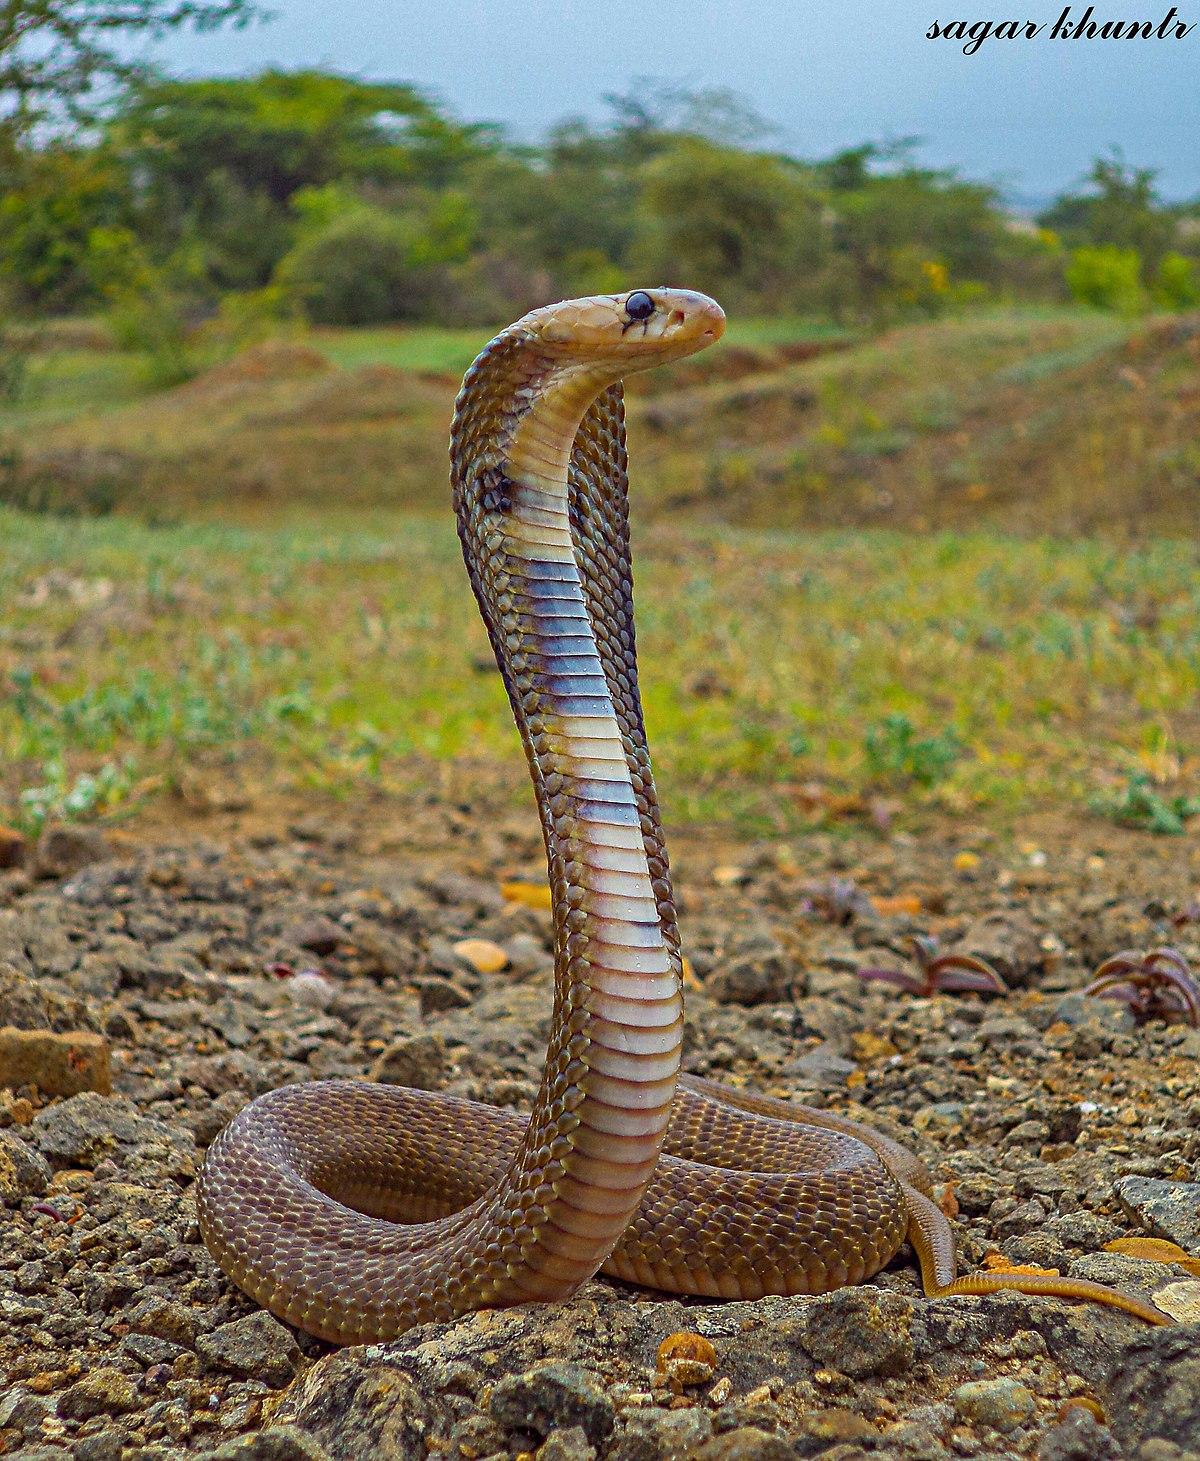 Cobra Naja   Fantasy monster, Humanoid creatures, Fantasy